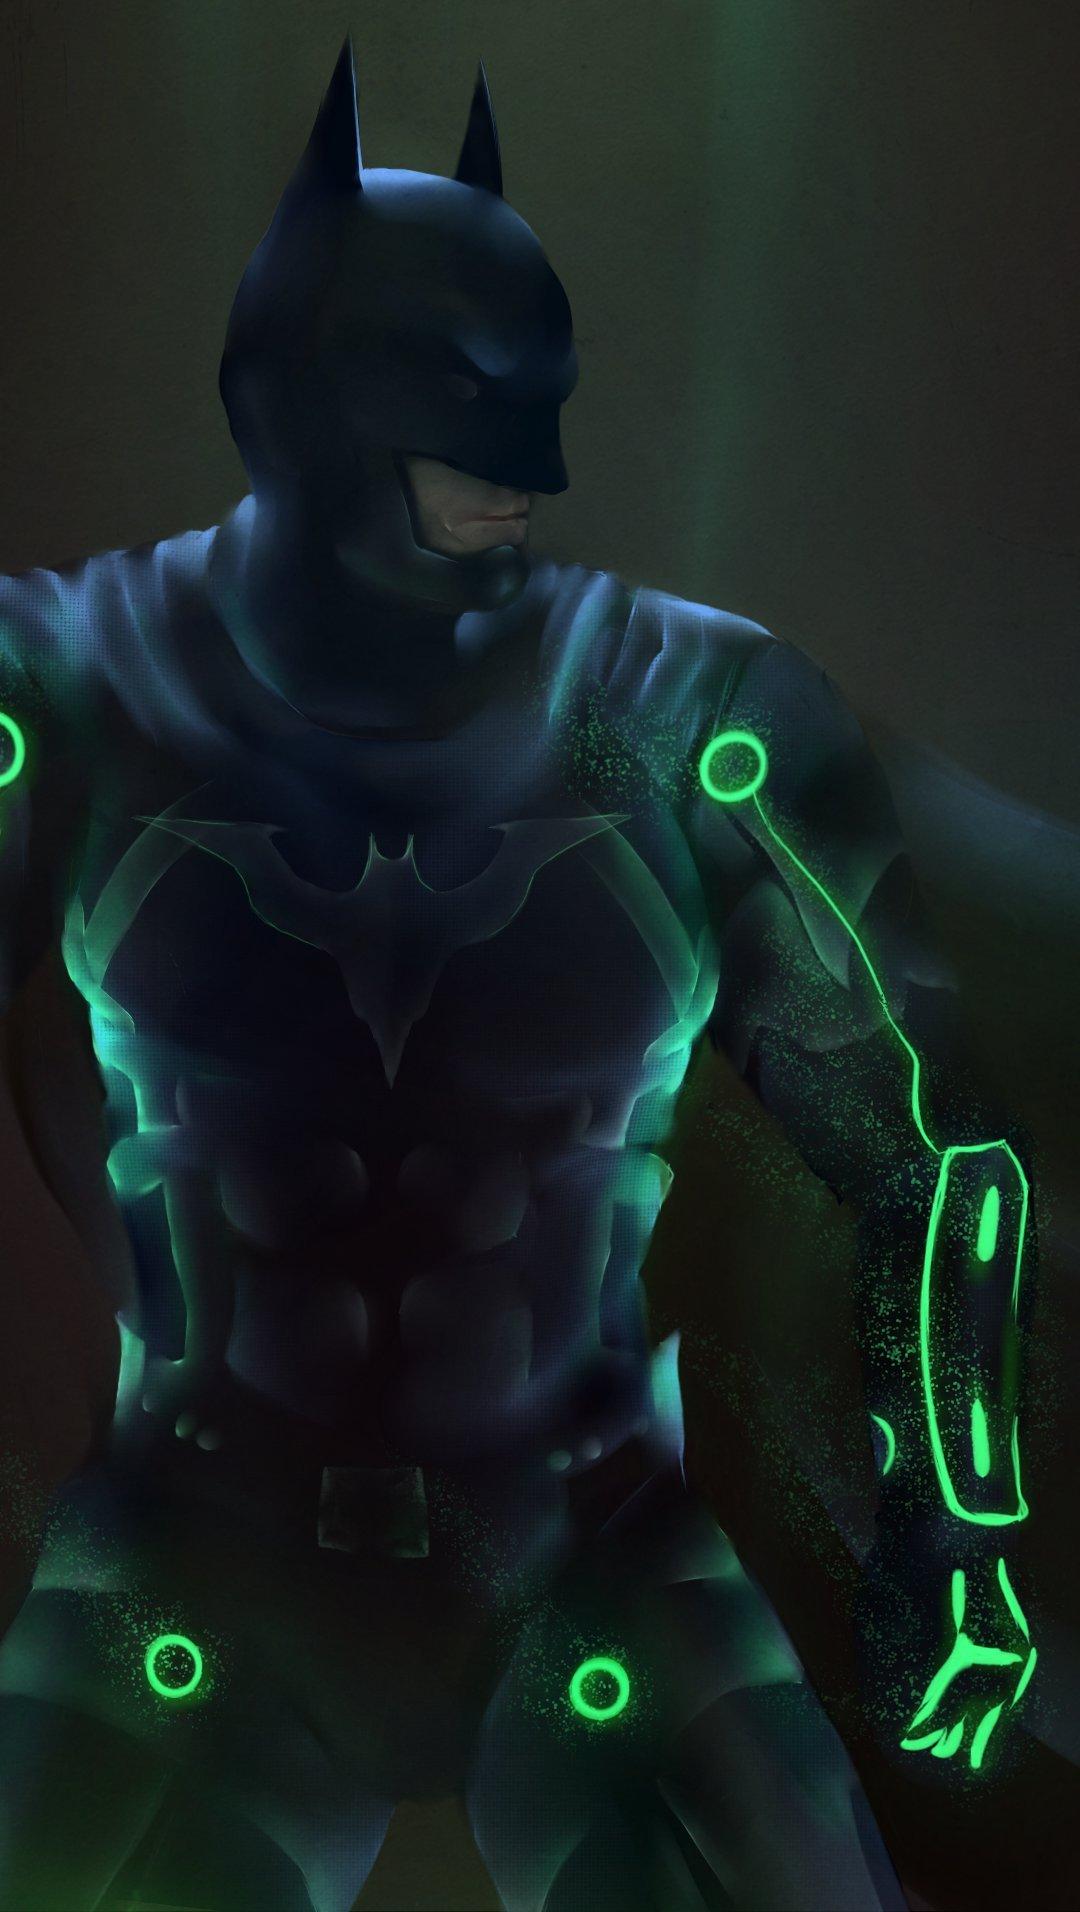 Wallpaper Batman in Injustice 2 Vertical